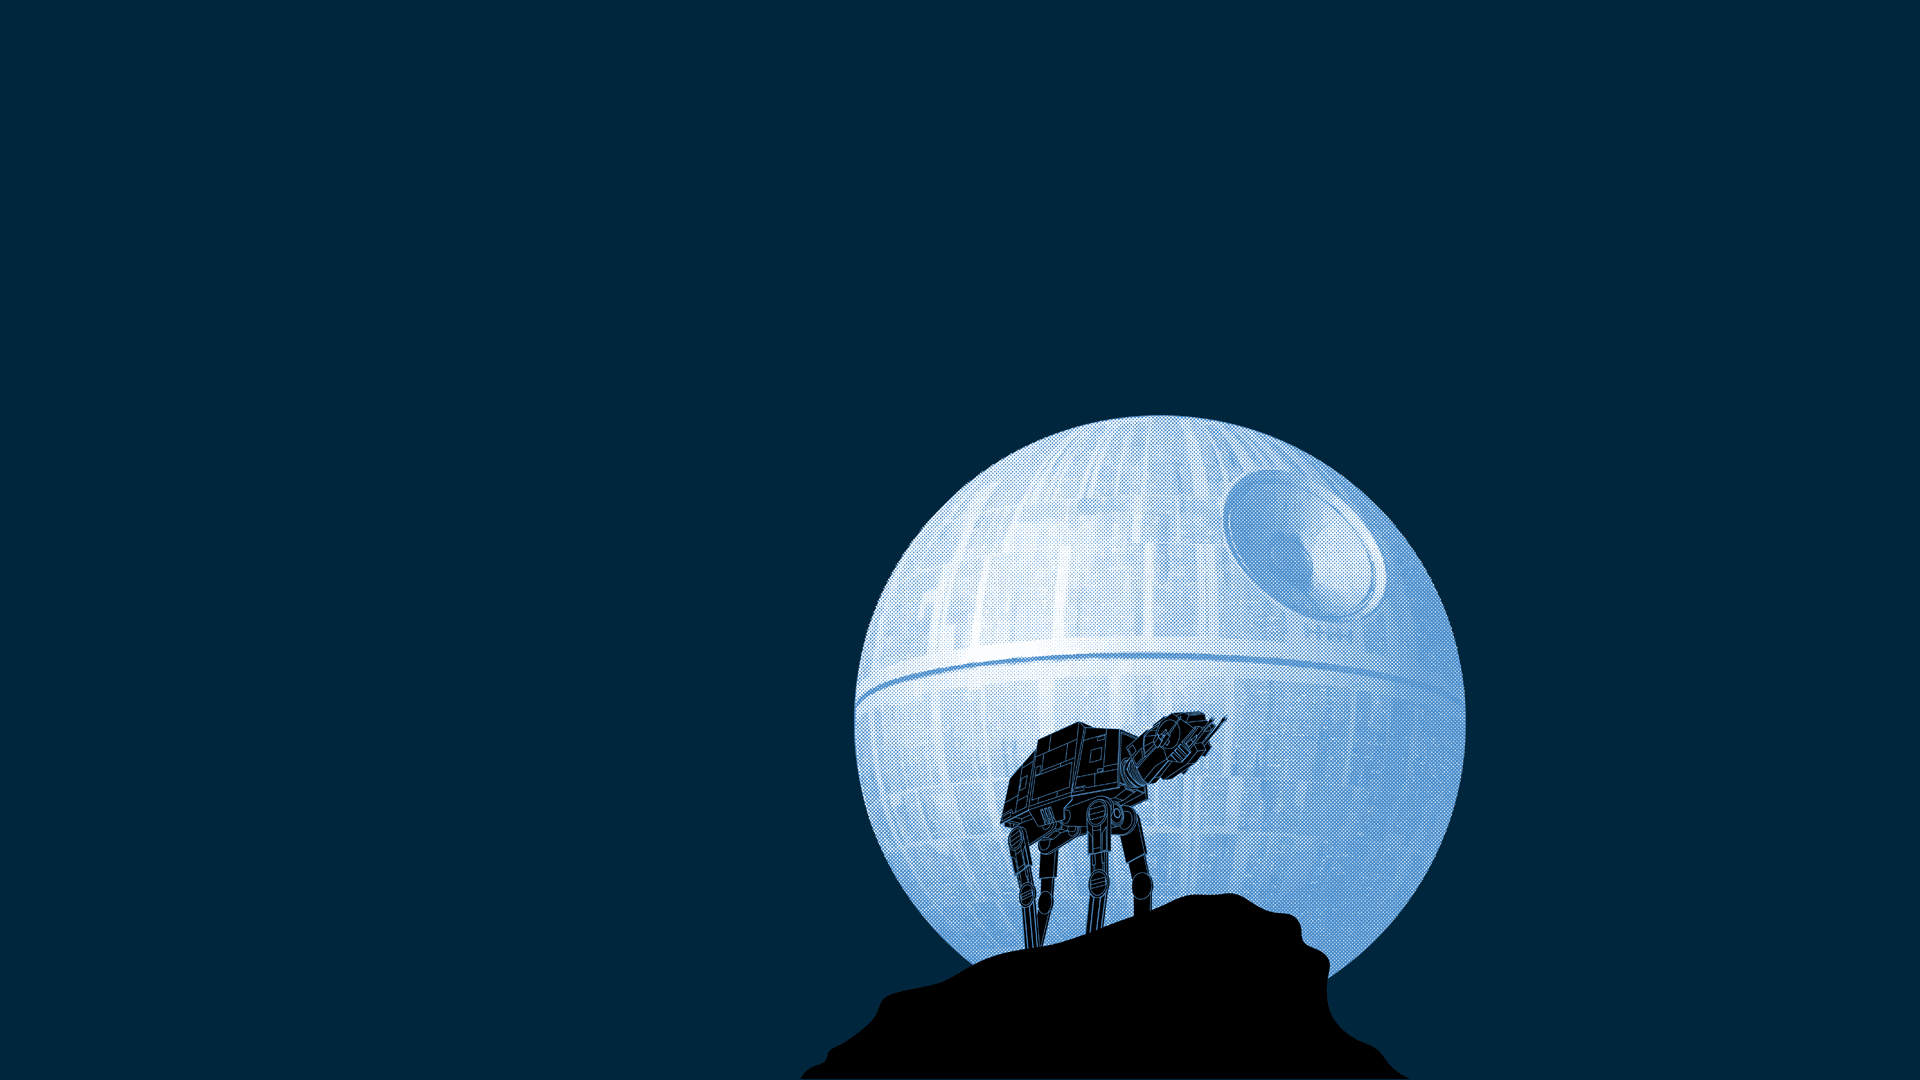 Blue Star Wars Background 1920x1080 Wallpaper Teahub Io